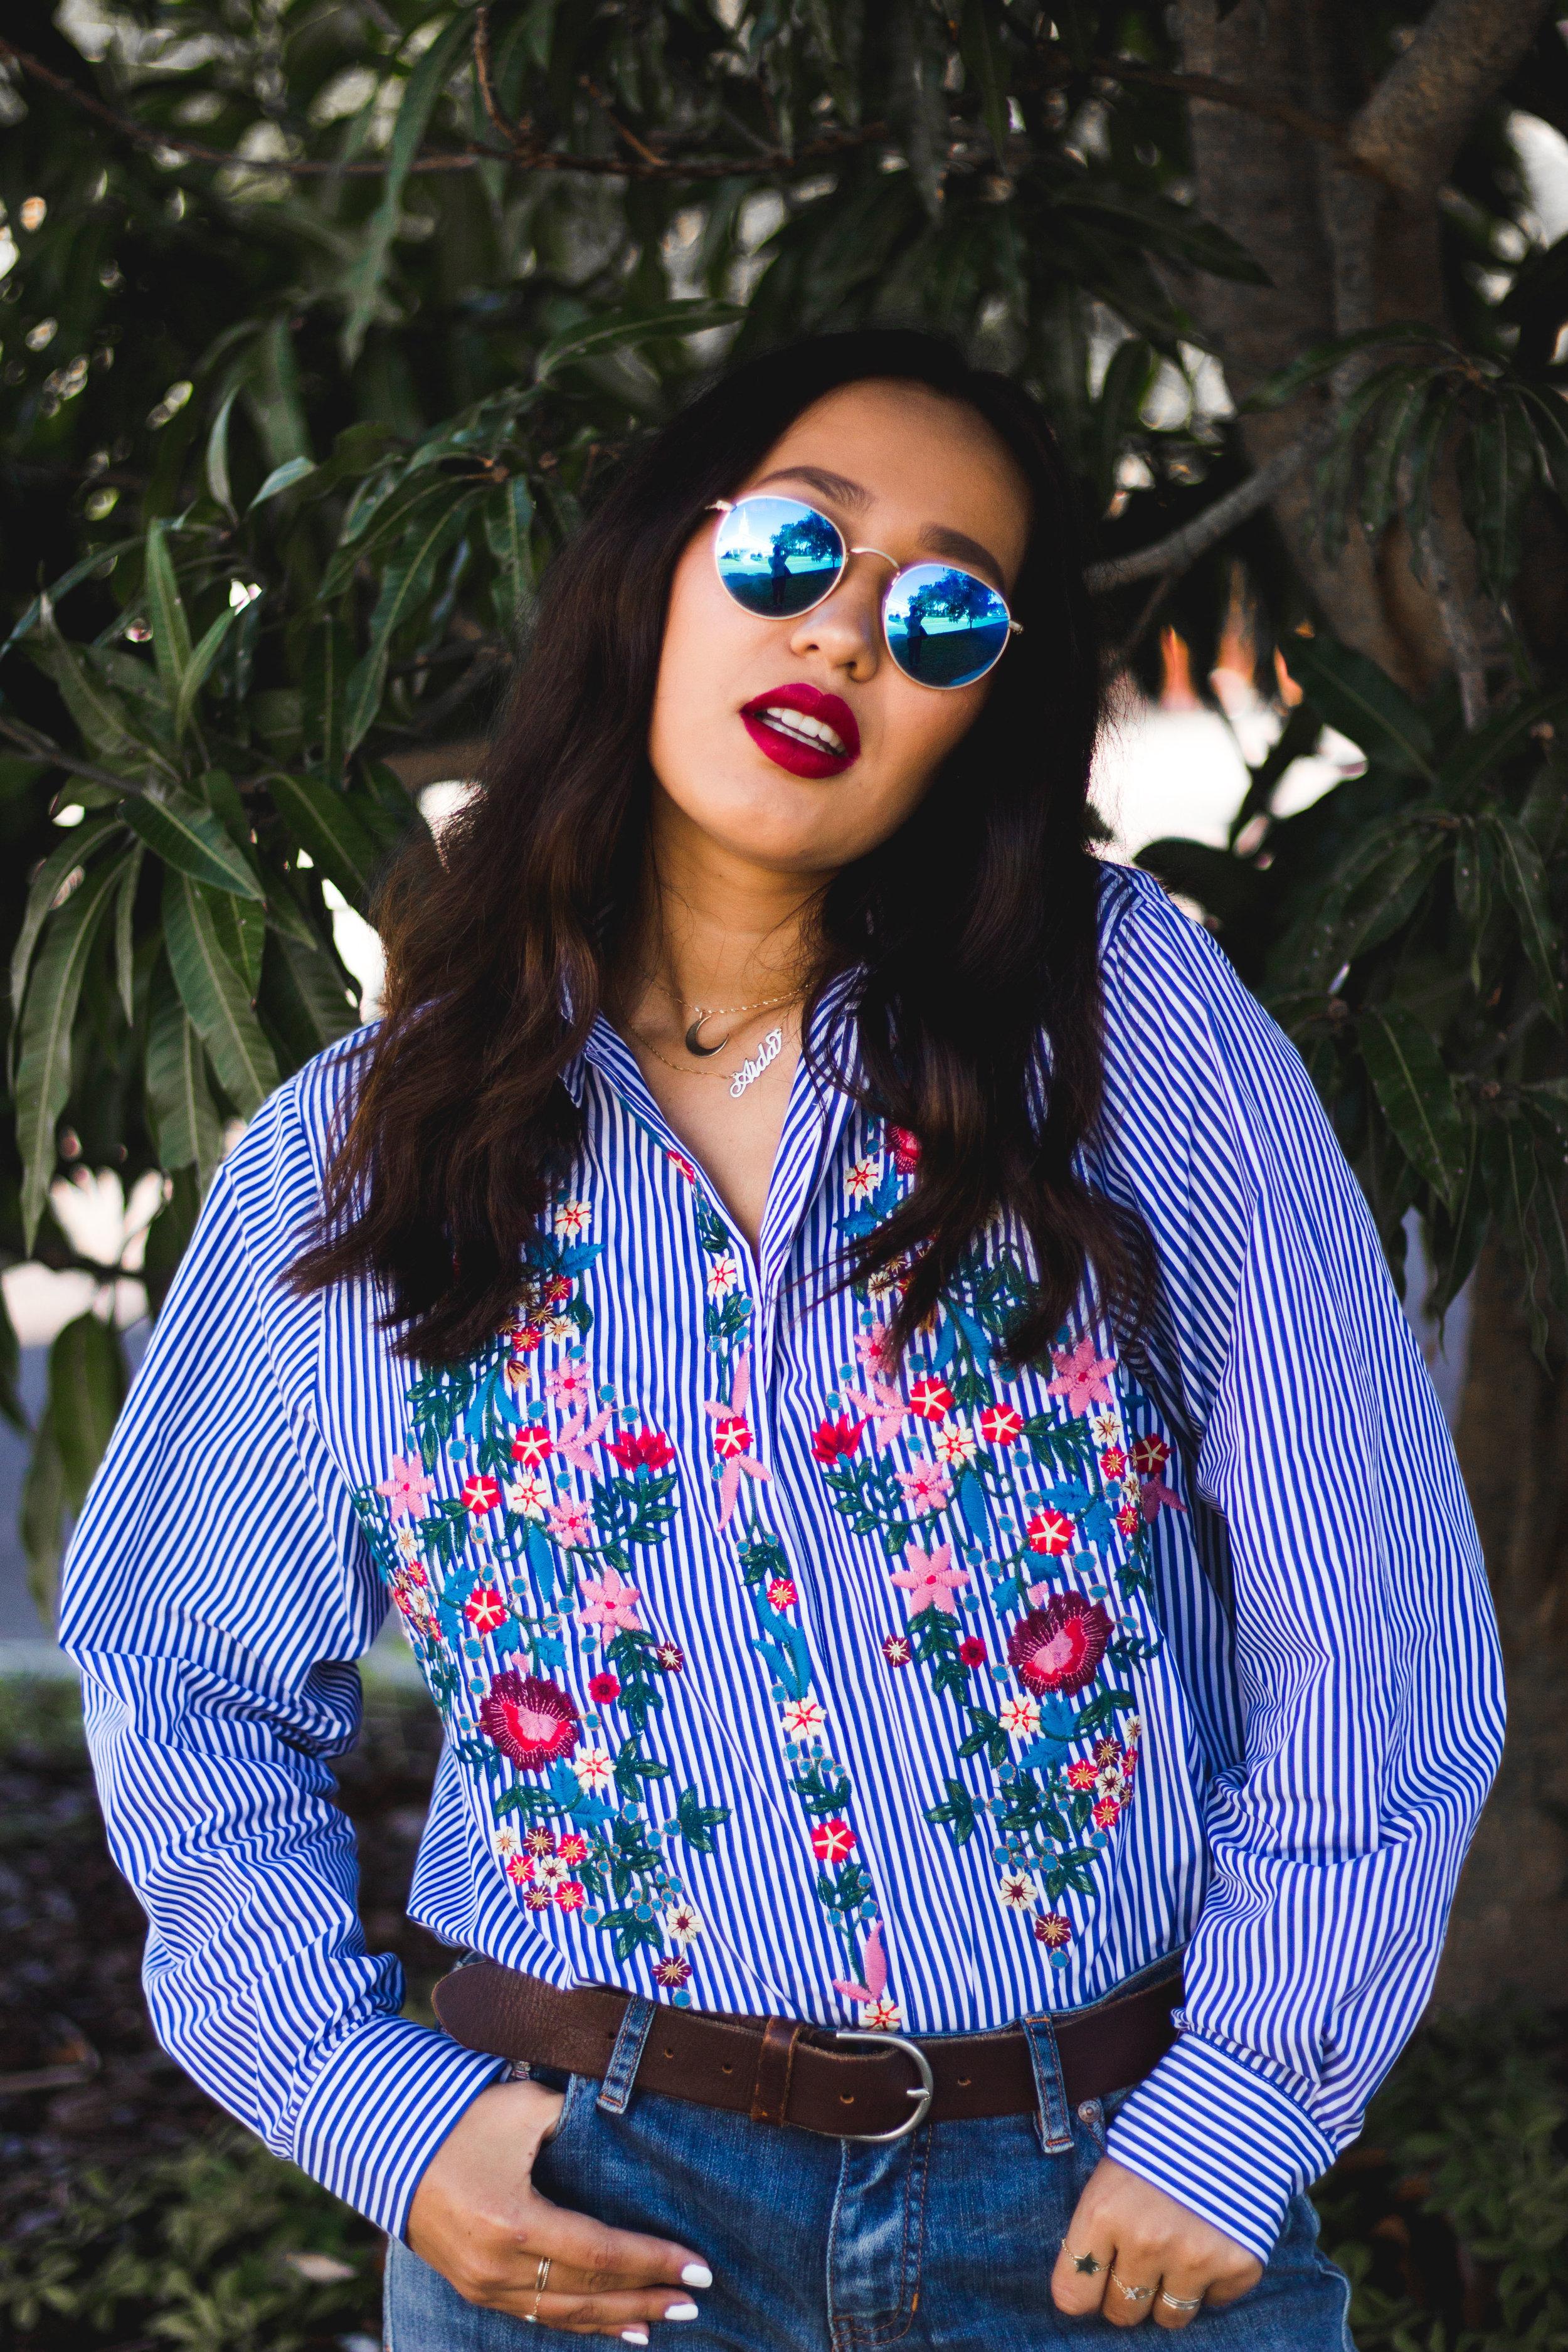 orlando-fashion-blogger-floral-shirt